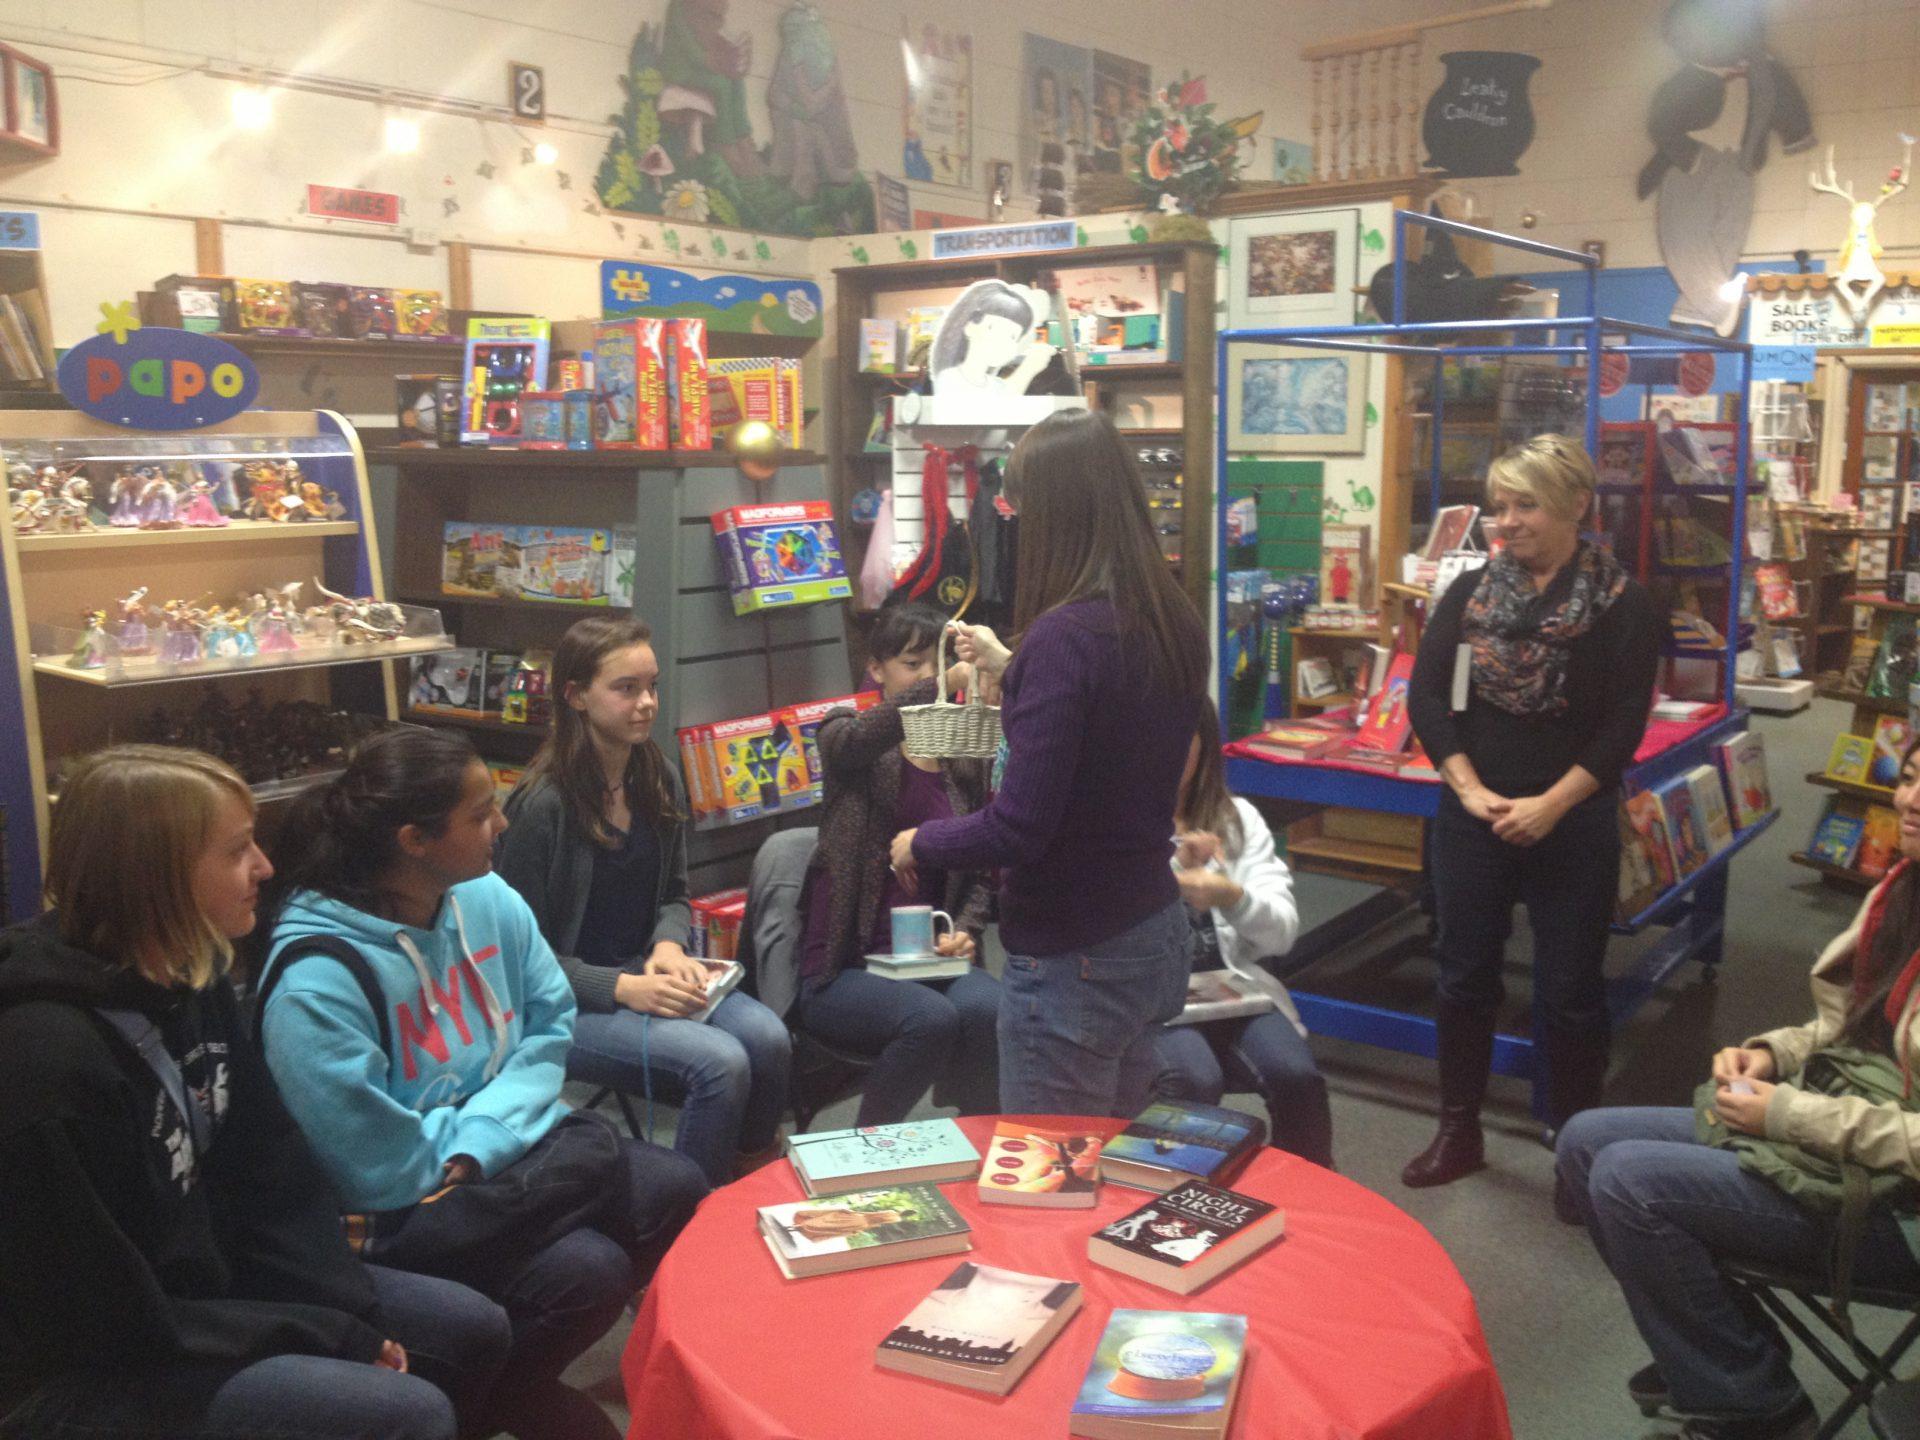 Hicklebee's Teen Book Club